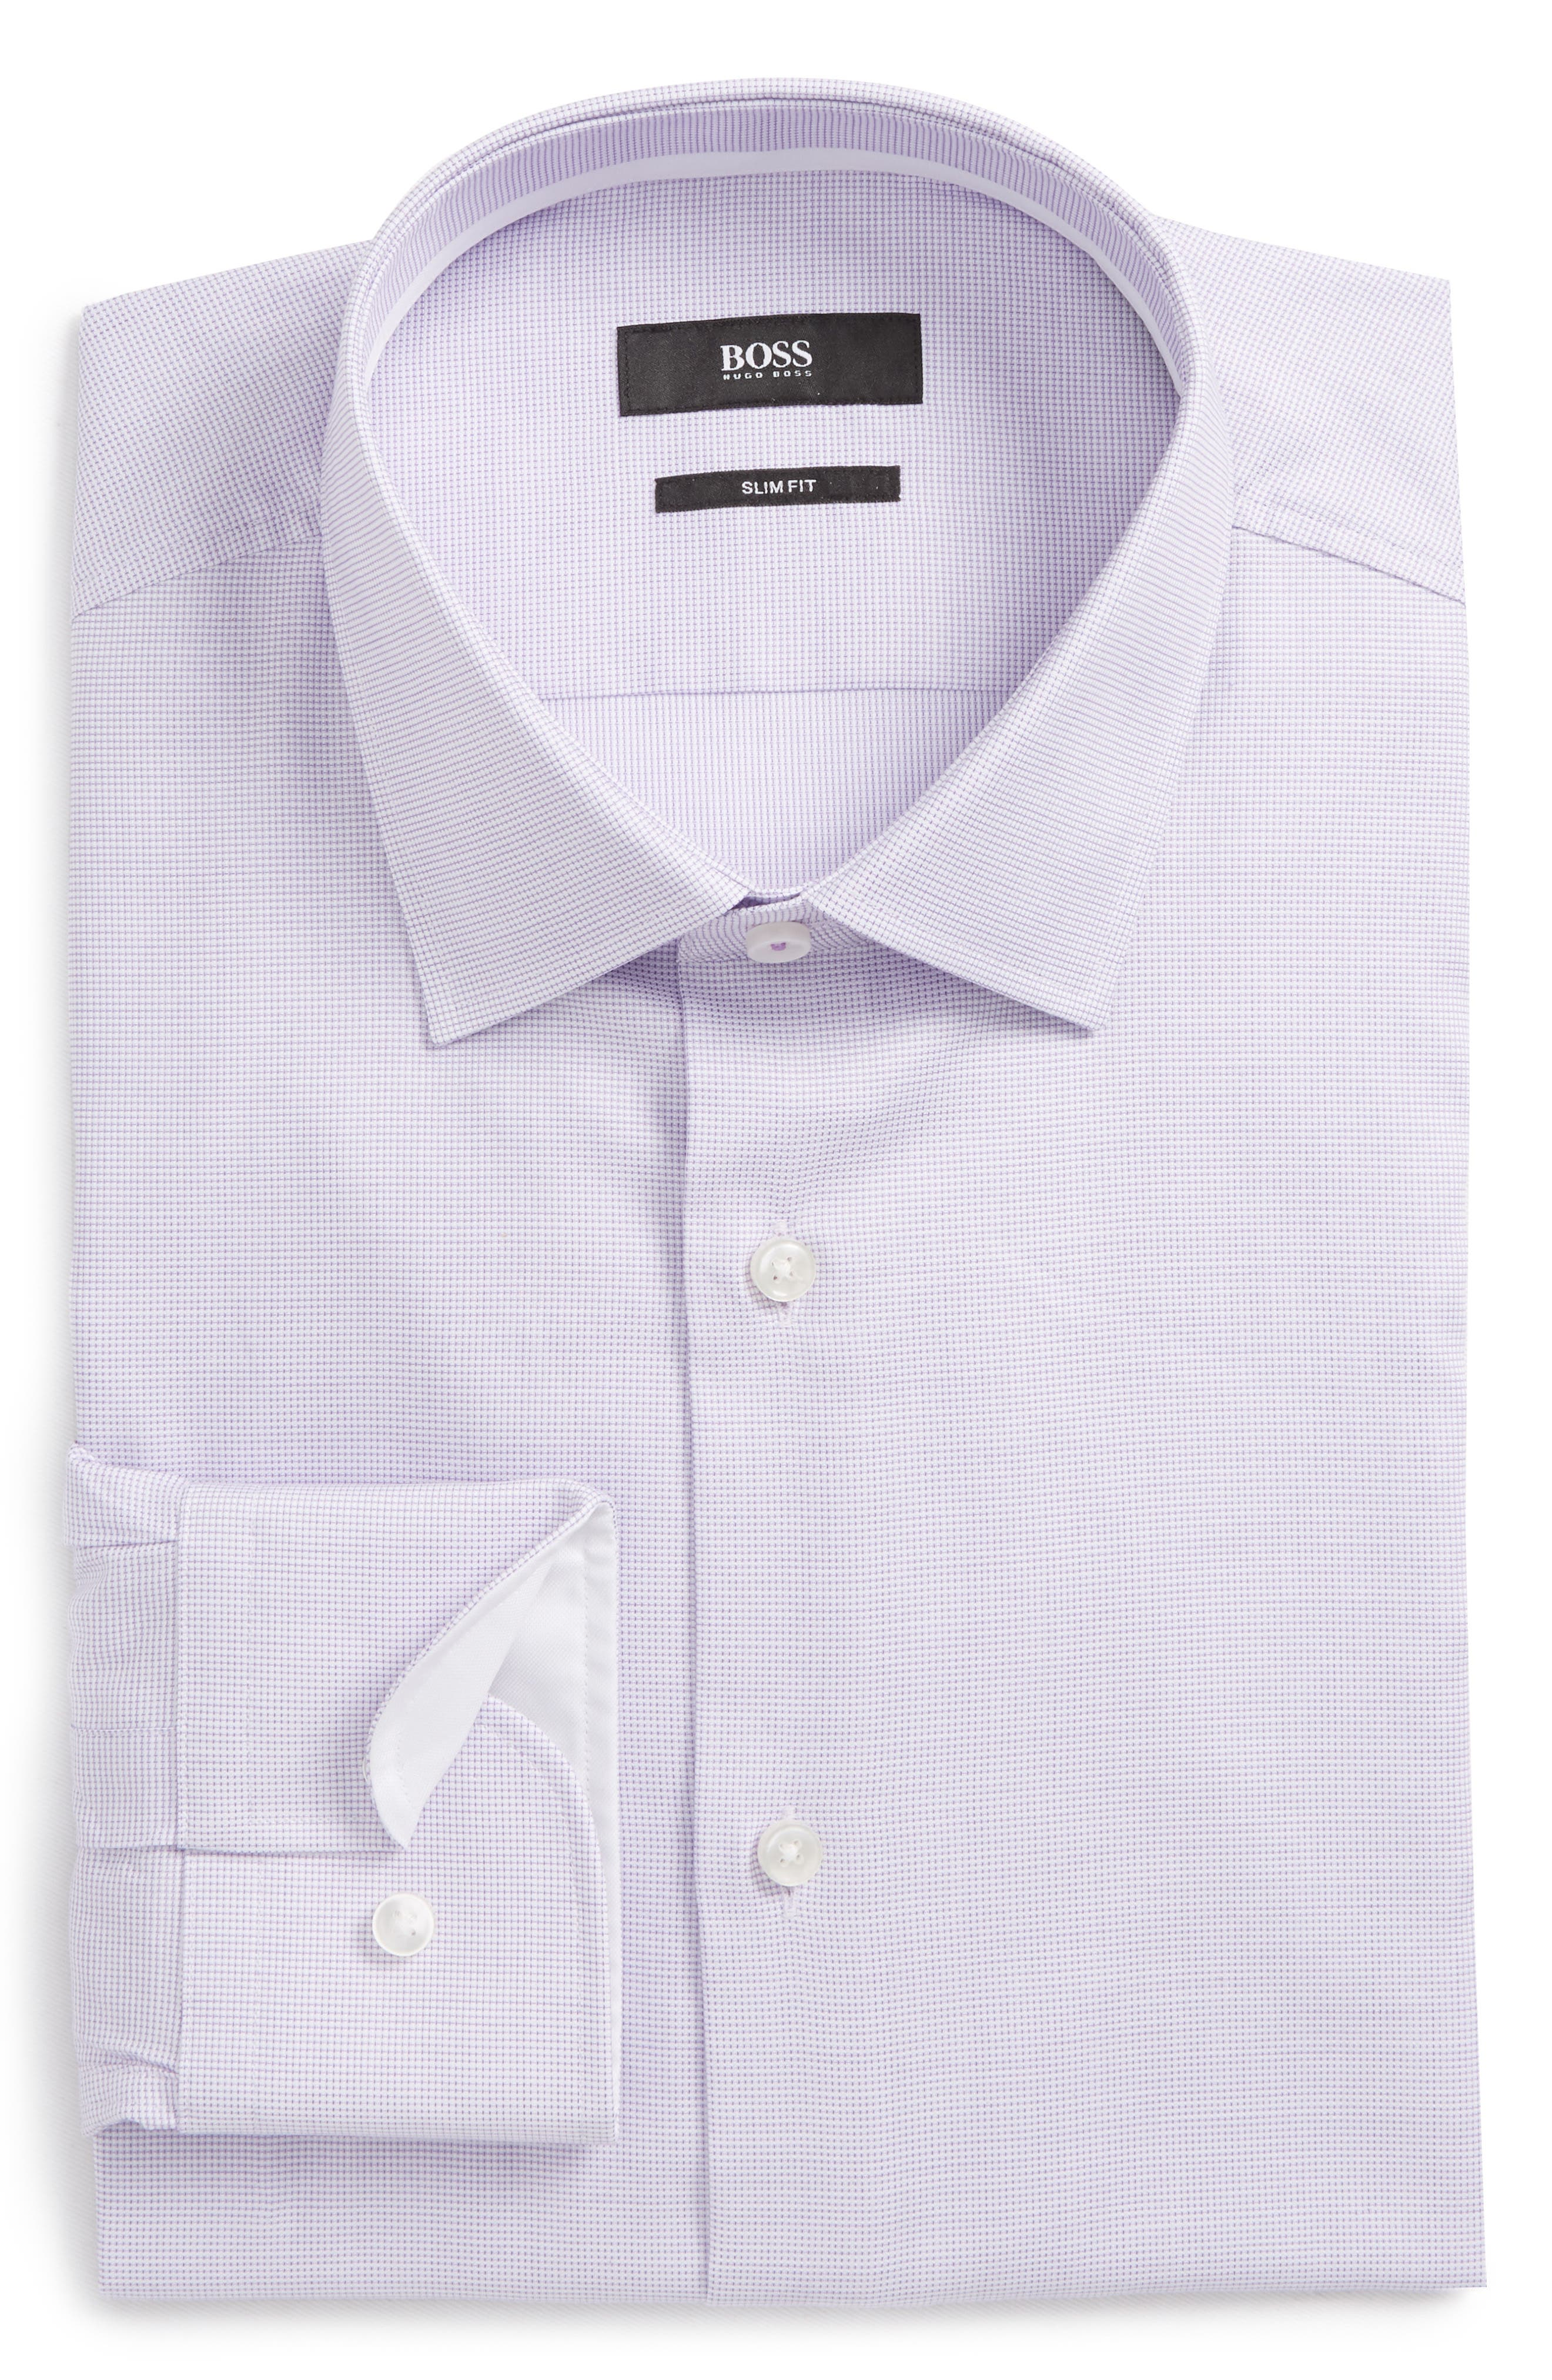 Jesse Slim Fit Dress Shirt,                             Alternate thumbnail 5, color,                             512